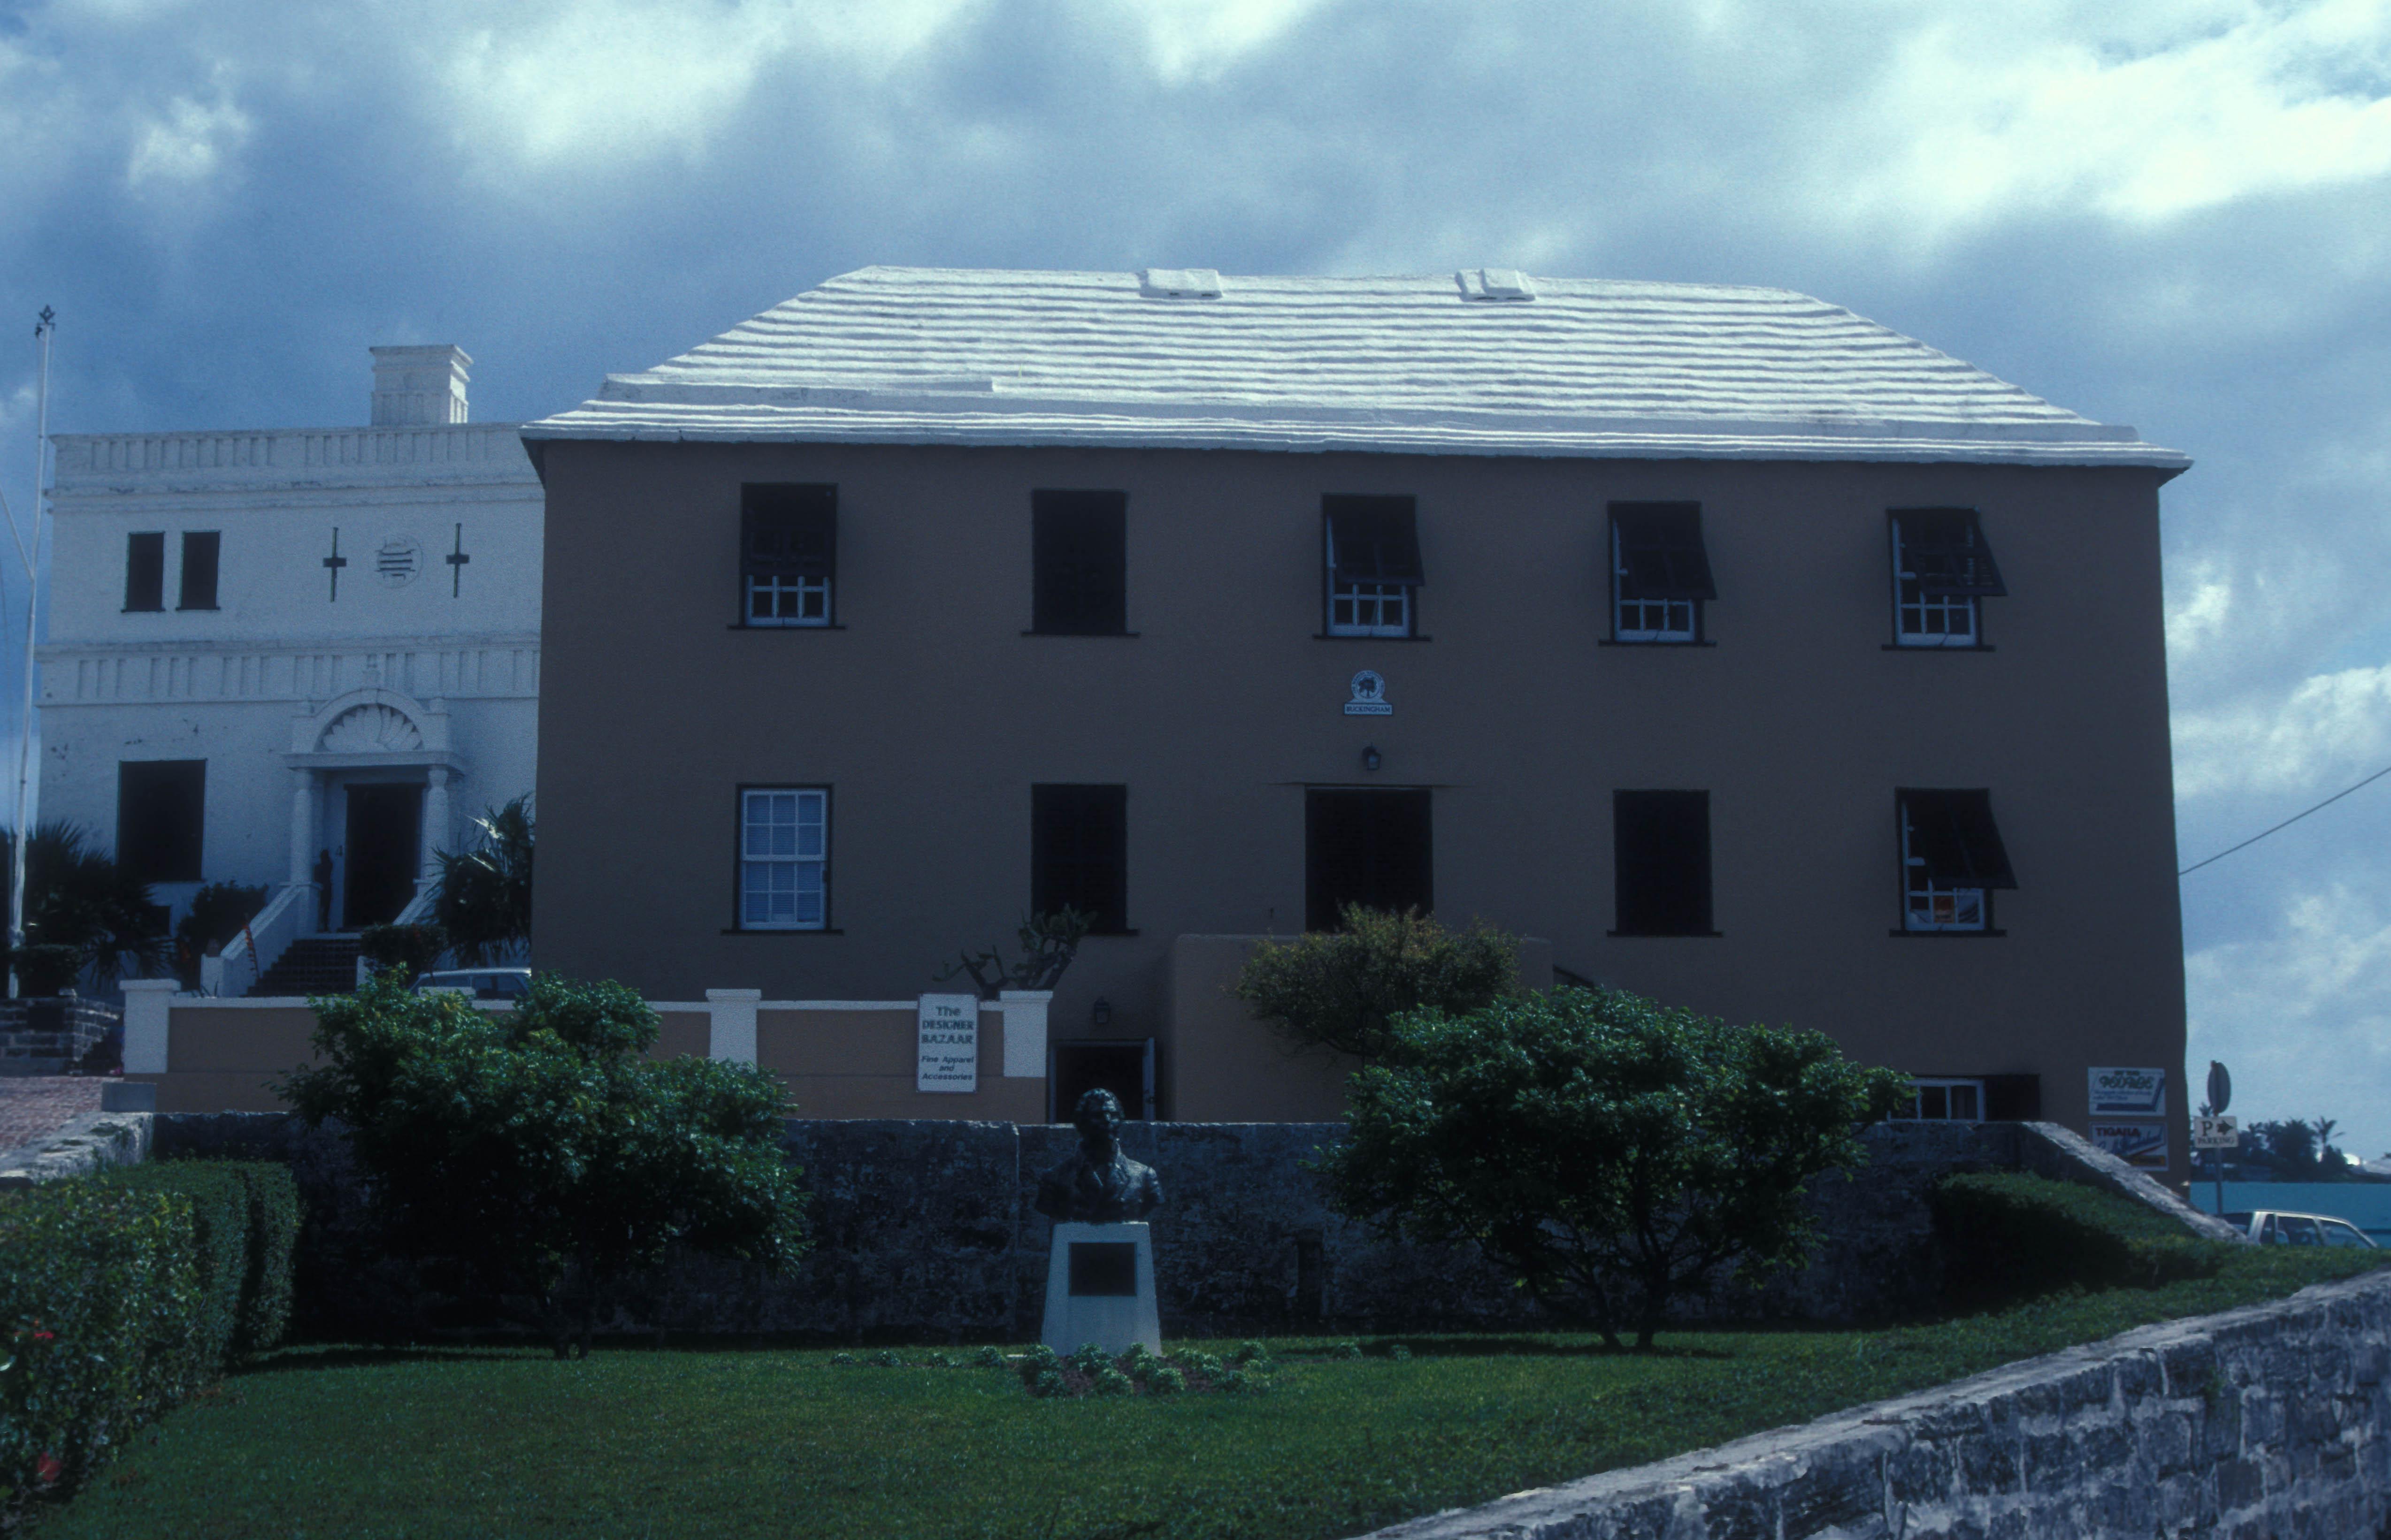 File BUCKINGHAM HOUSE ST GEORGE Wikimedia Commons